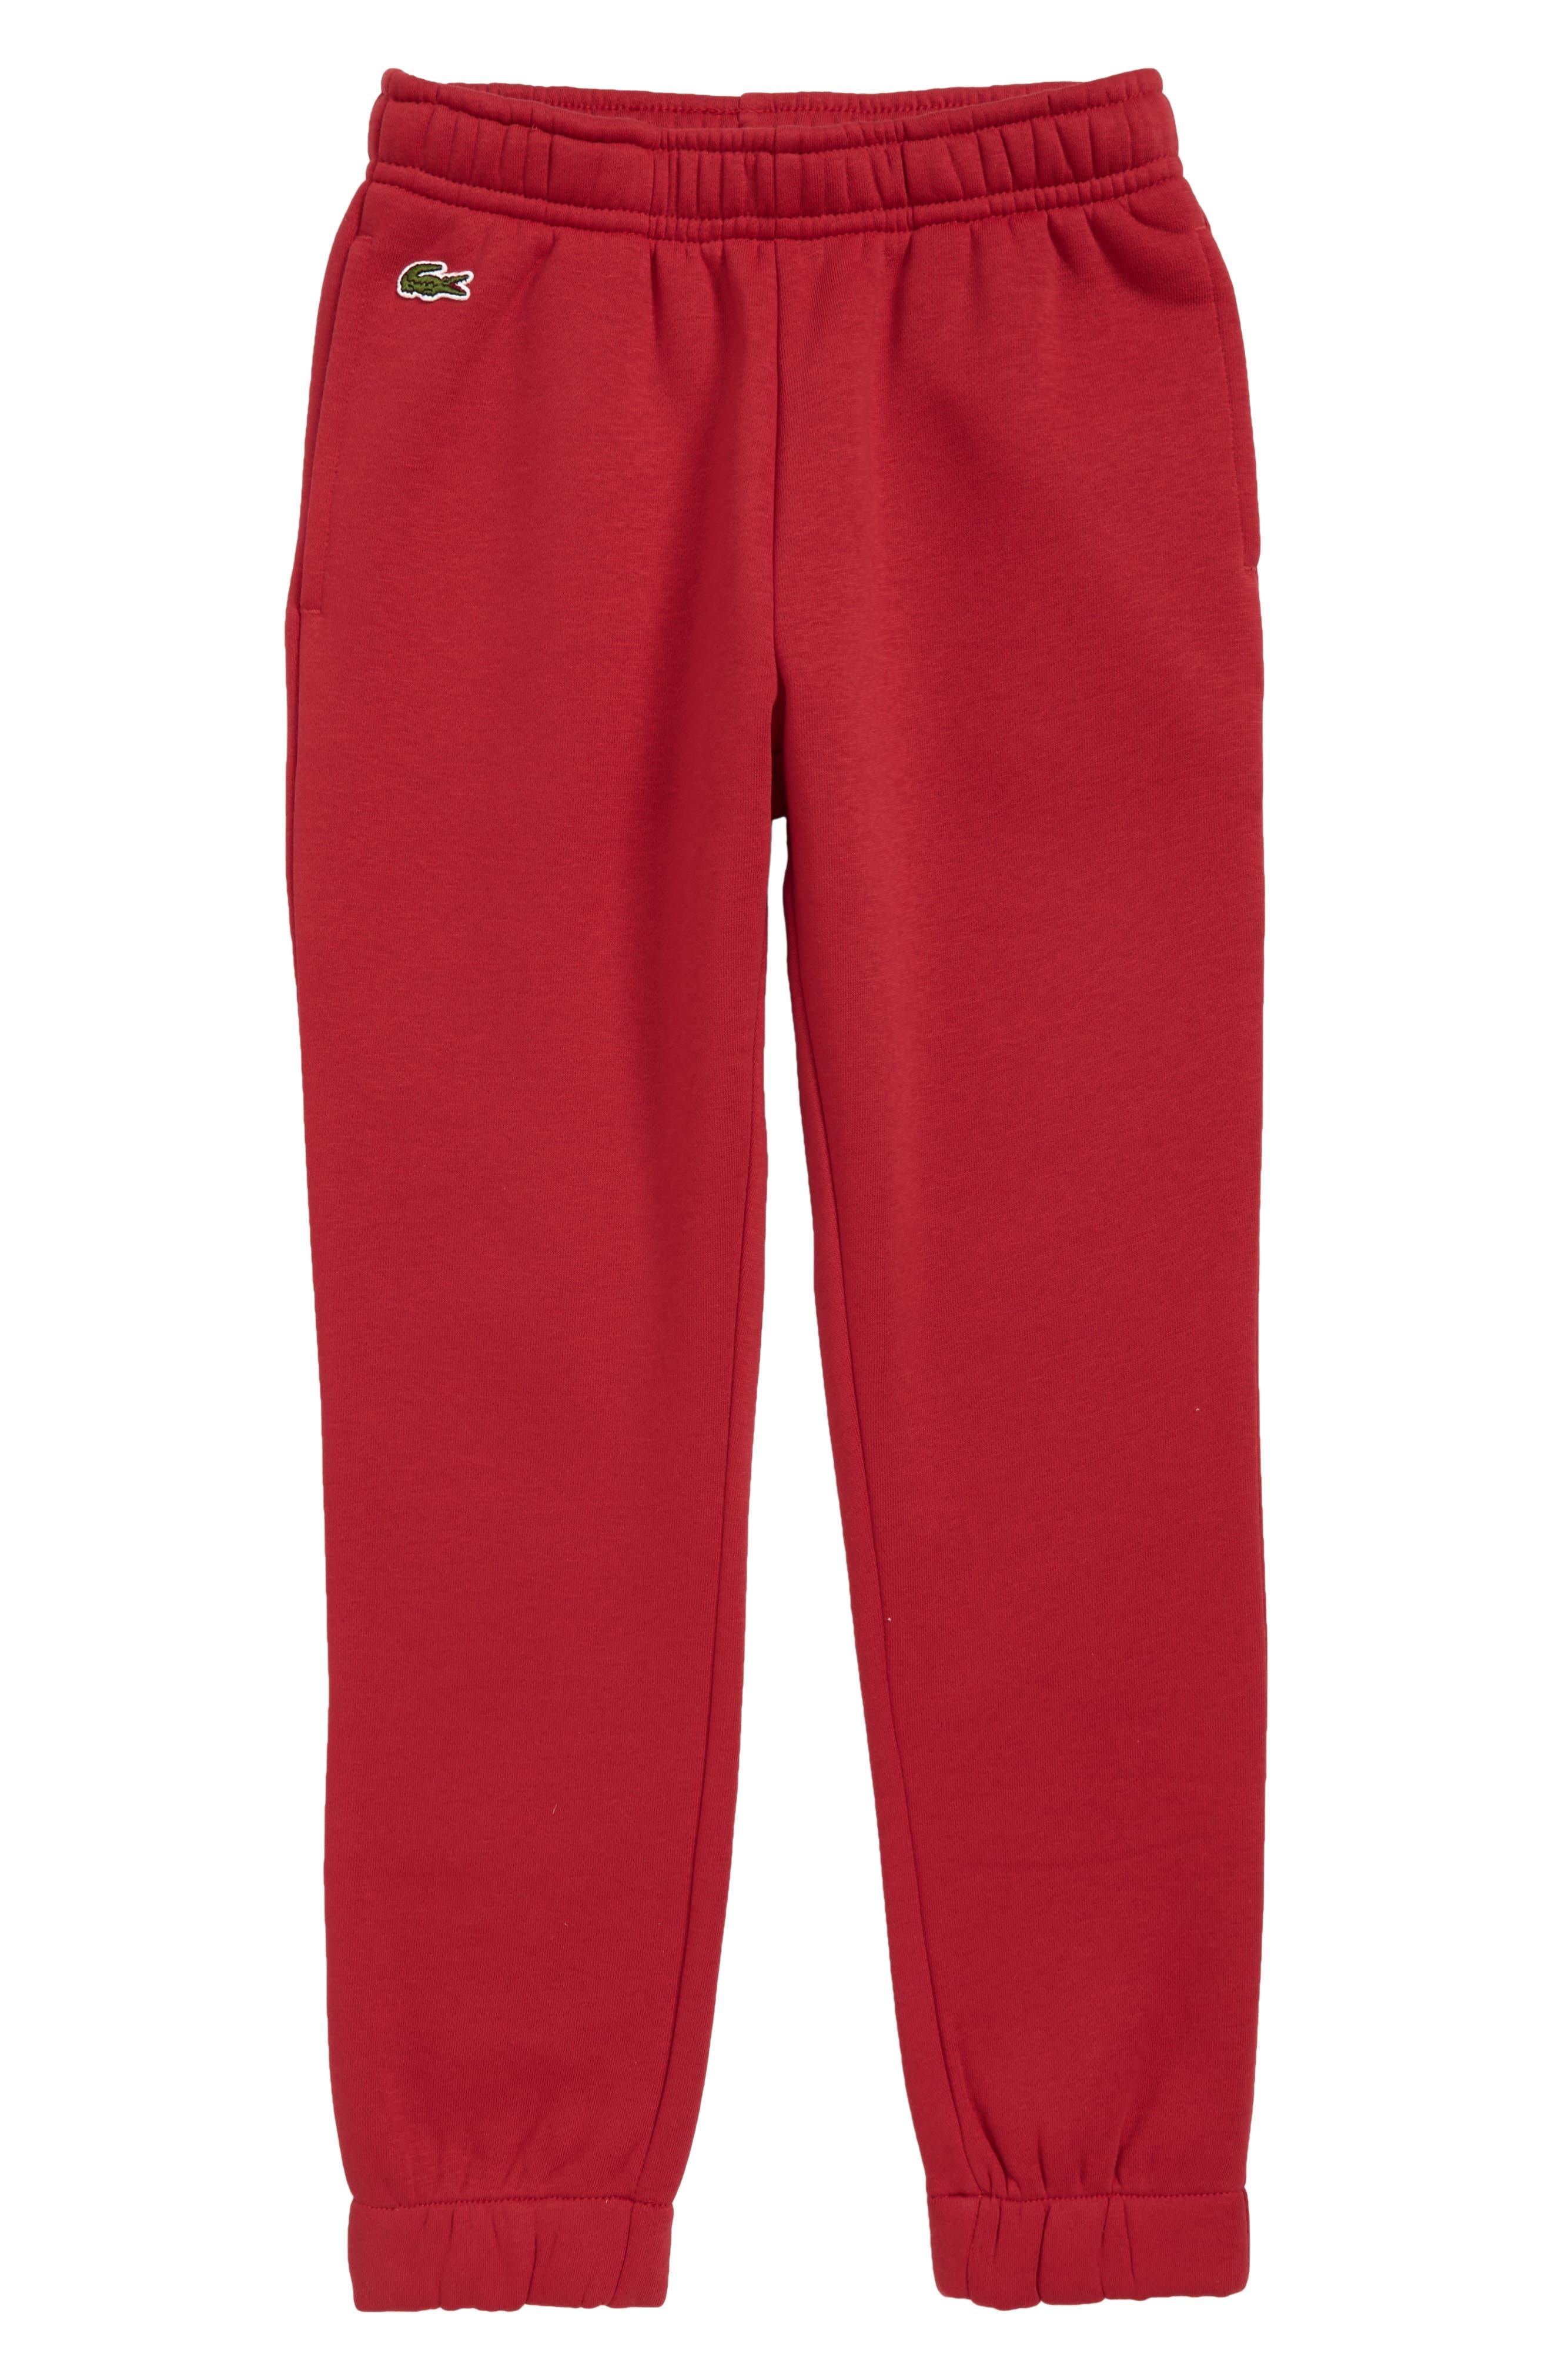 LACOSTE, Fleece Pants, Main thumbnail 1, color, LIGHTHOUSE RED